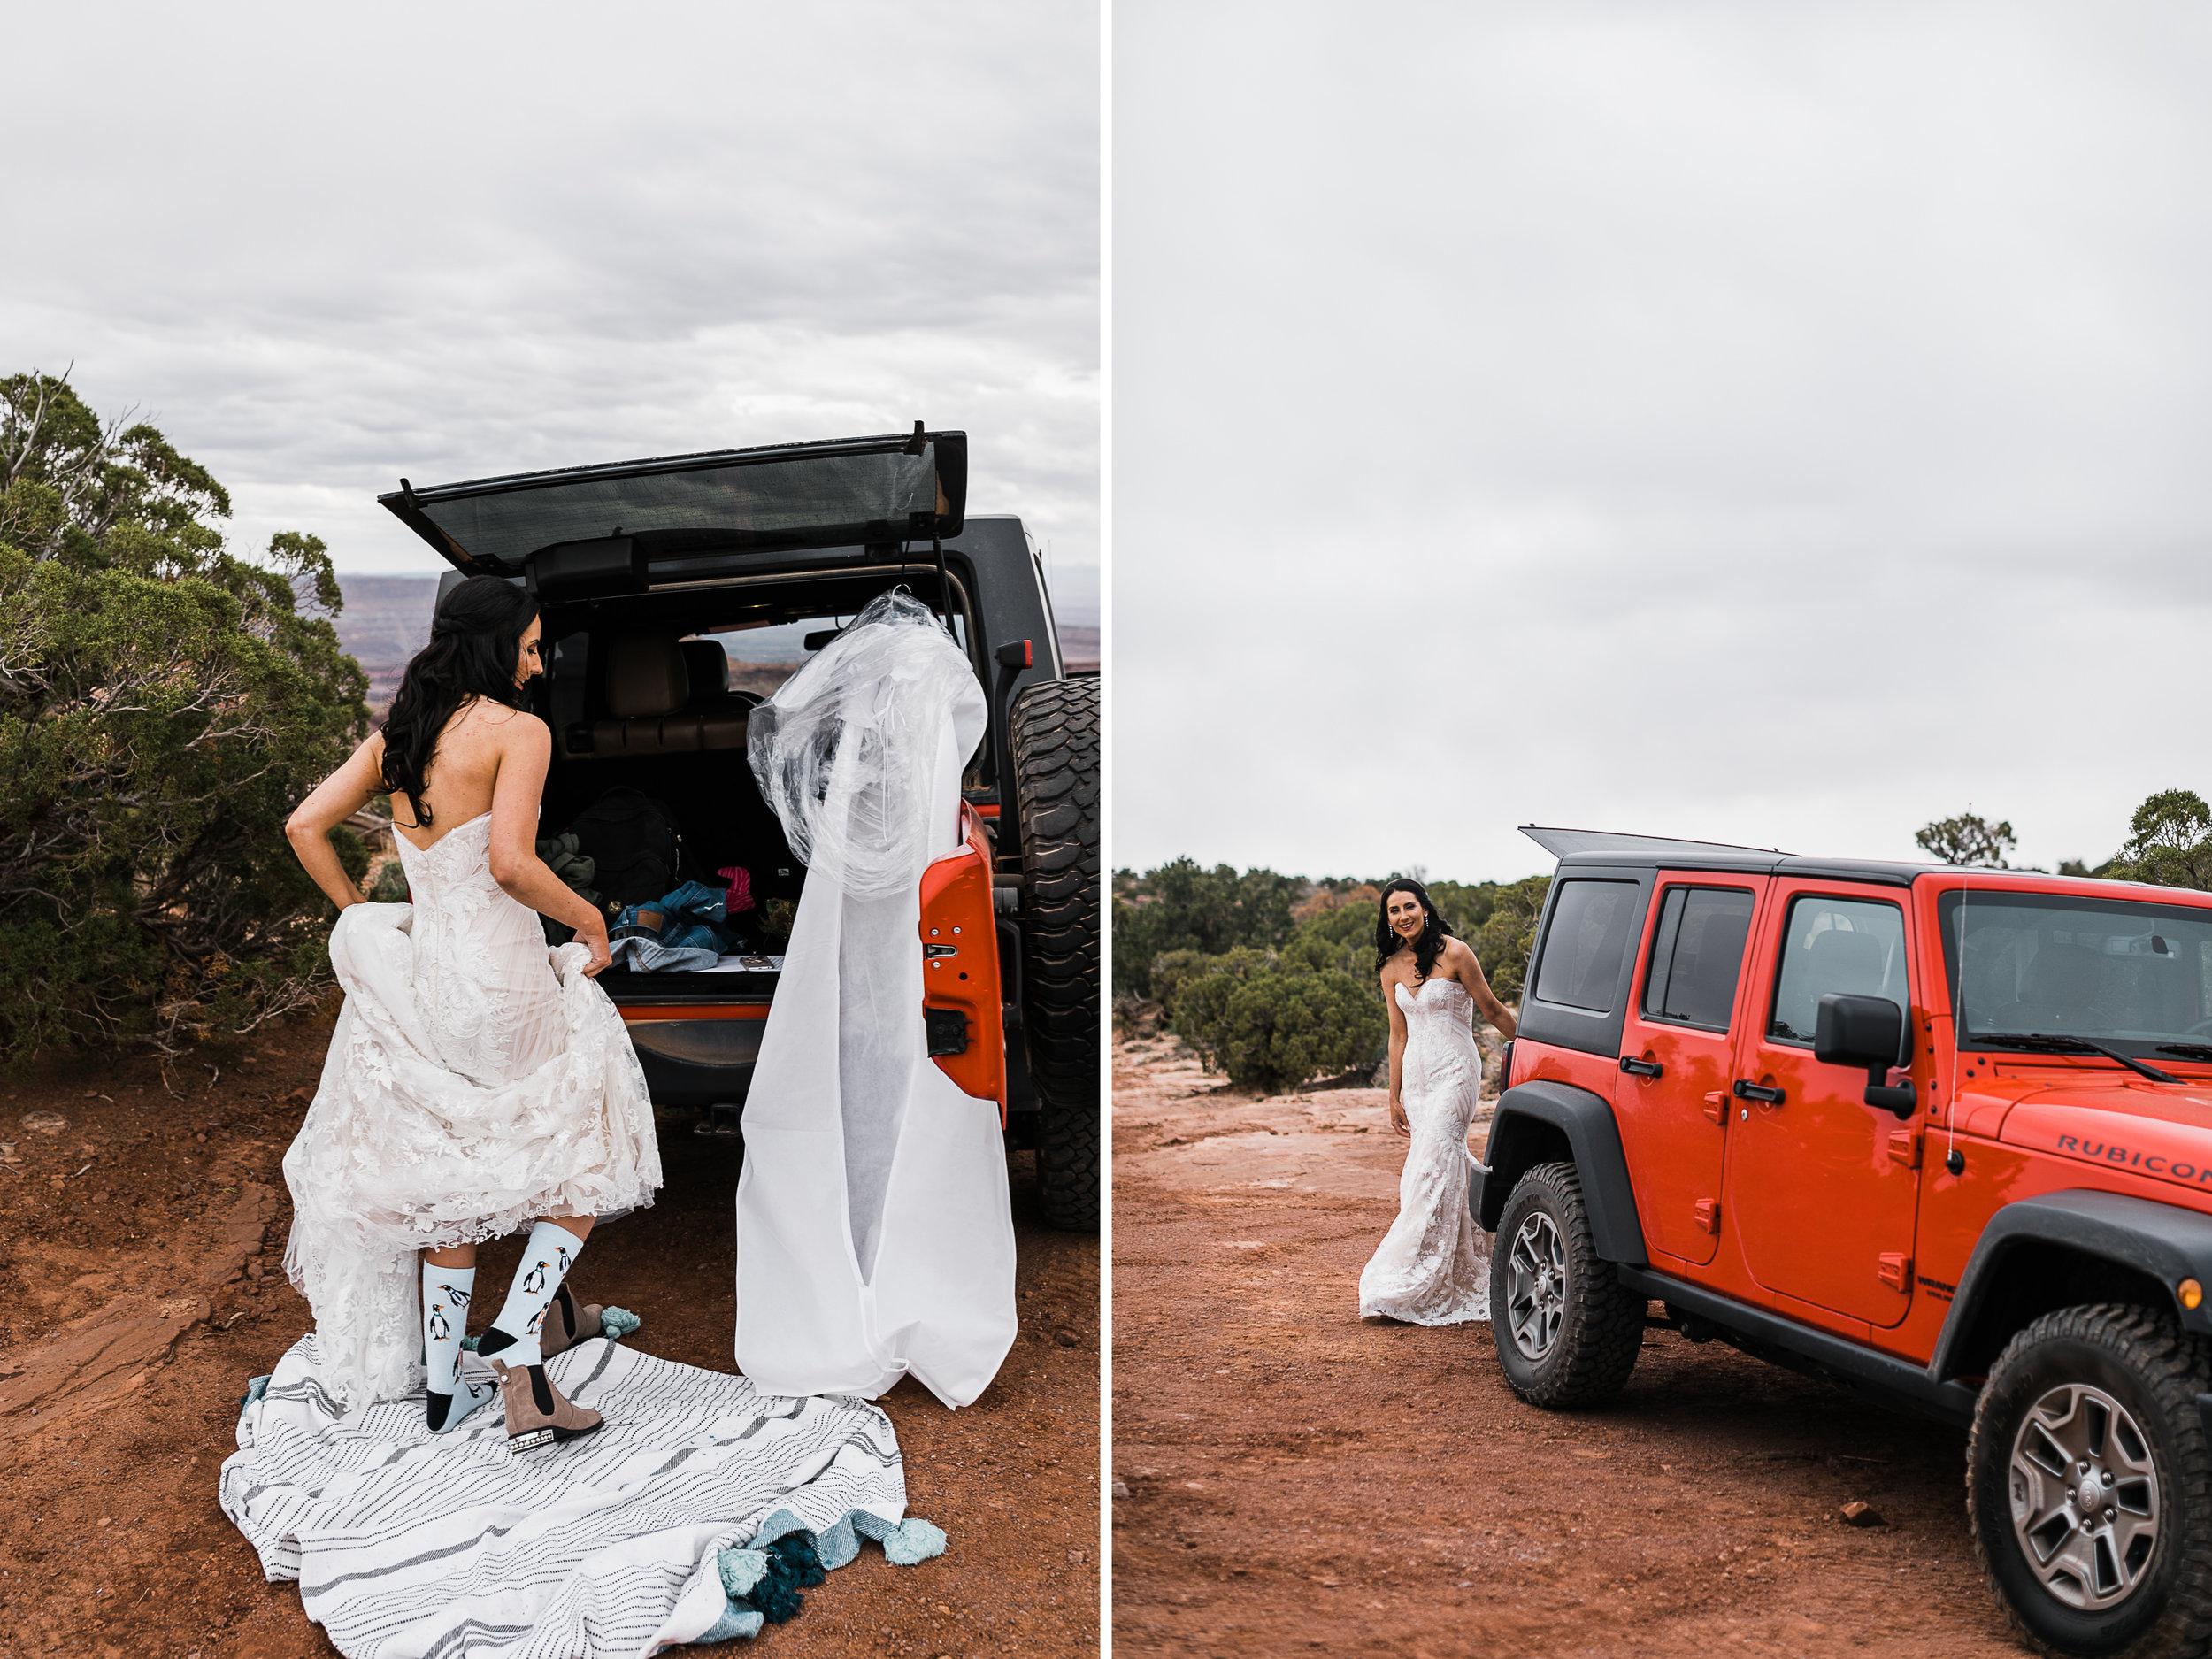 Jeep-Wedding-Moab-Utah-Hearnes-Adventure-Elopement-Photography-5.jpg